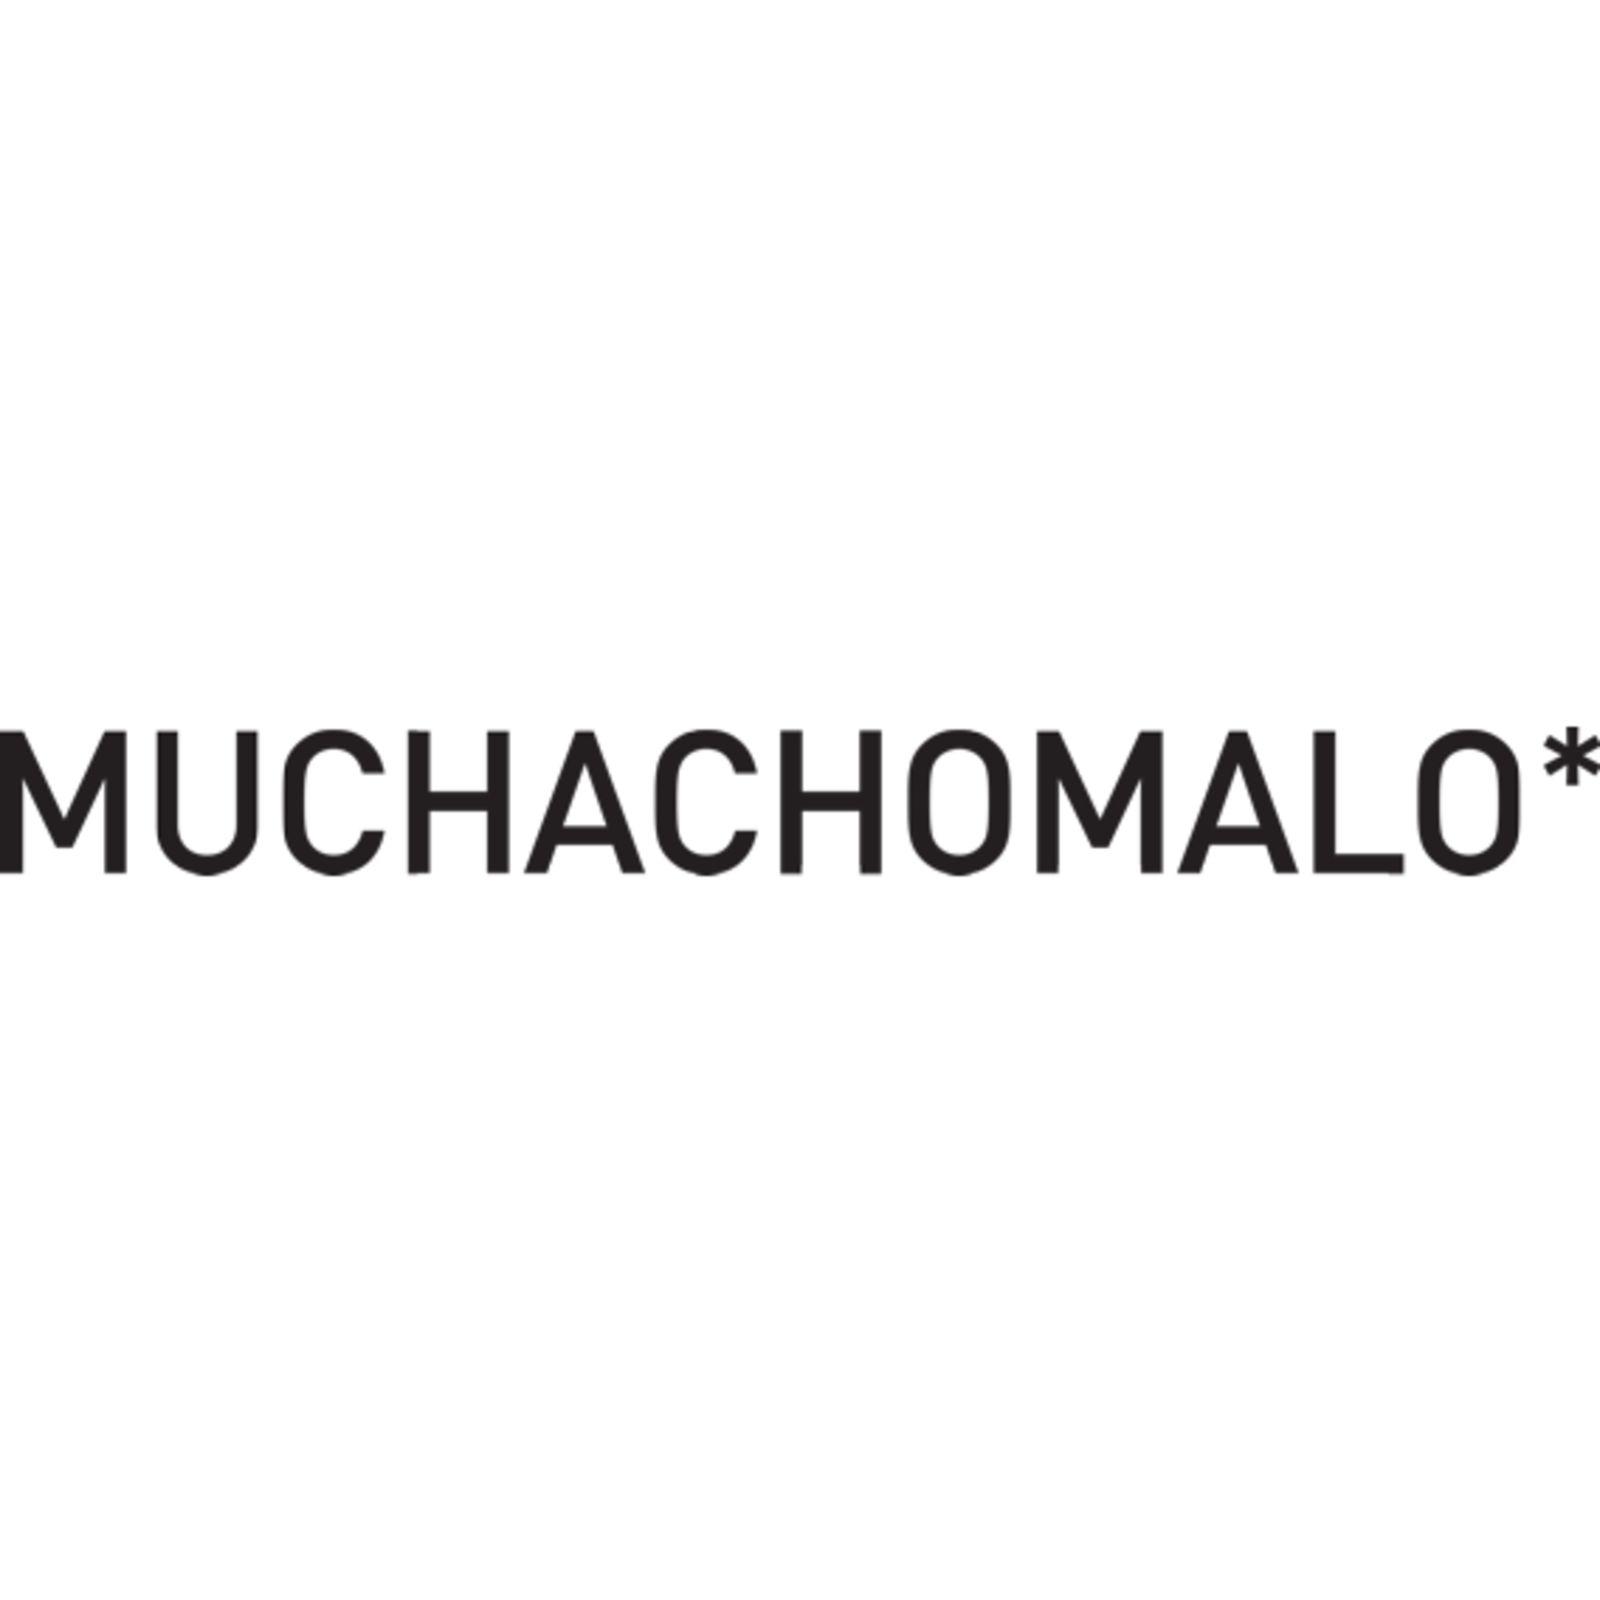 MUCHACHOMALO*